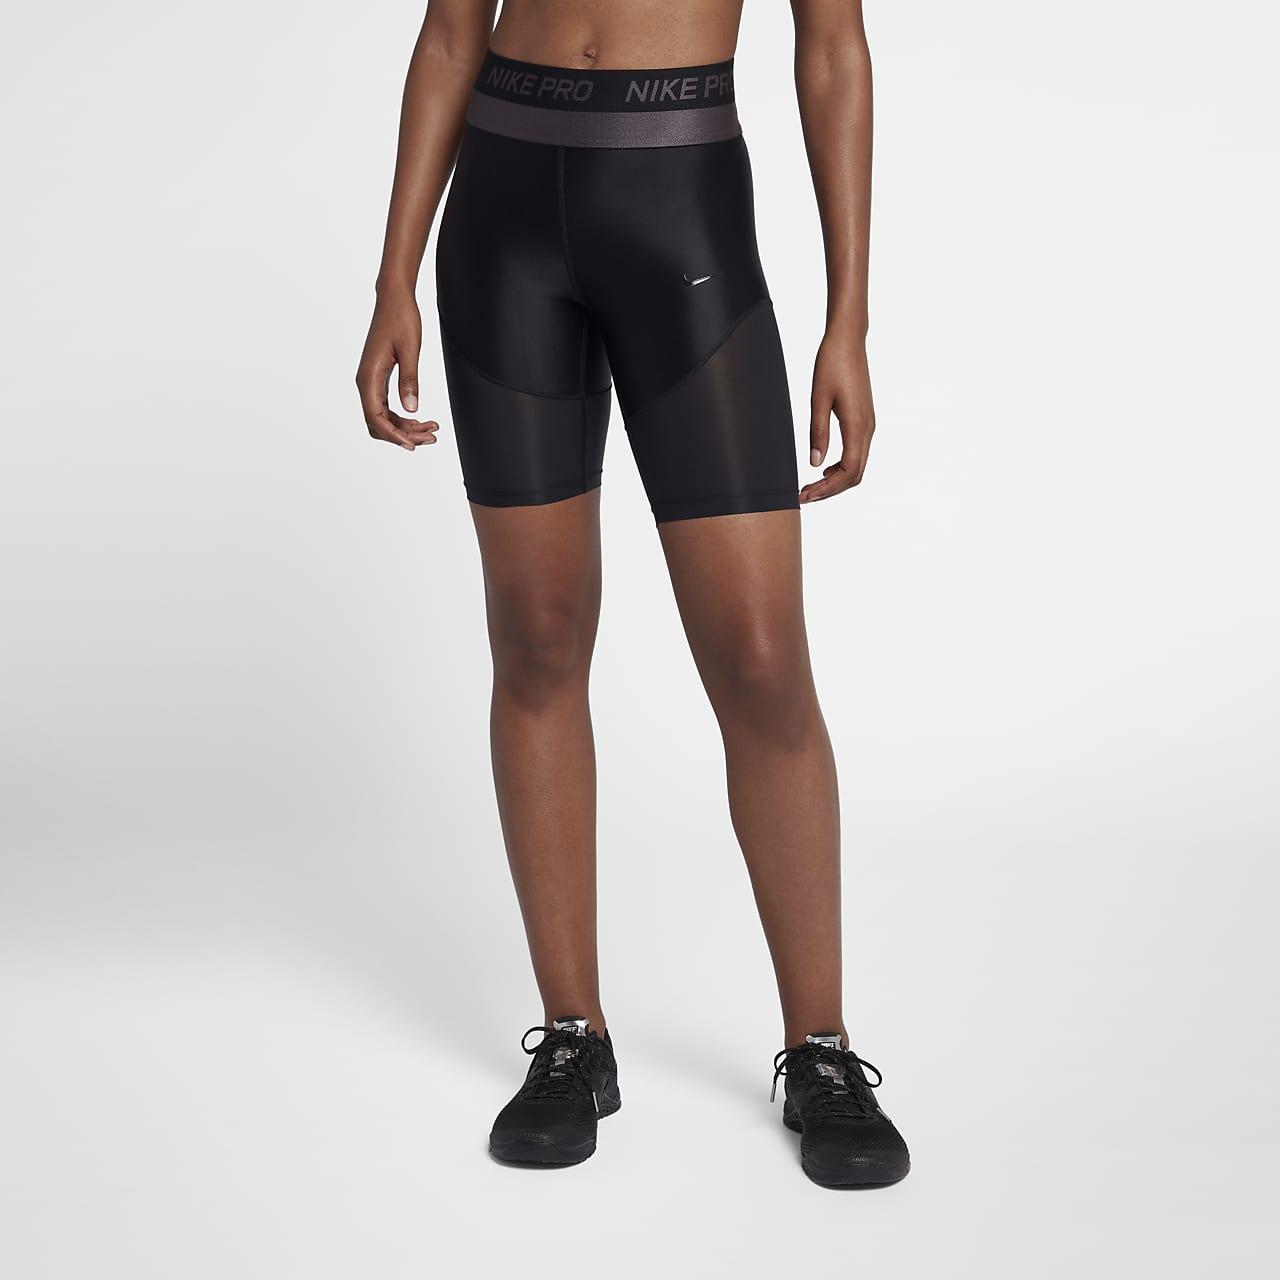 Nike Pro HyperCool Women's Training Shorts